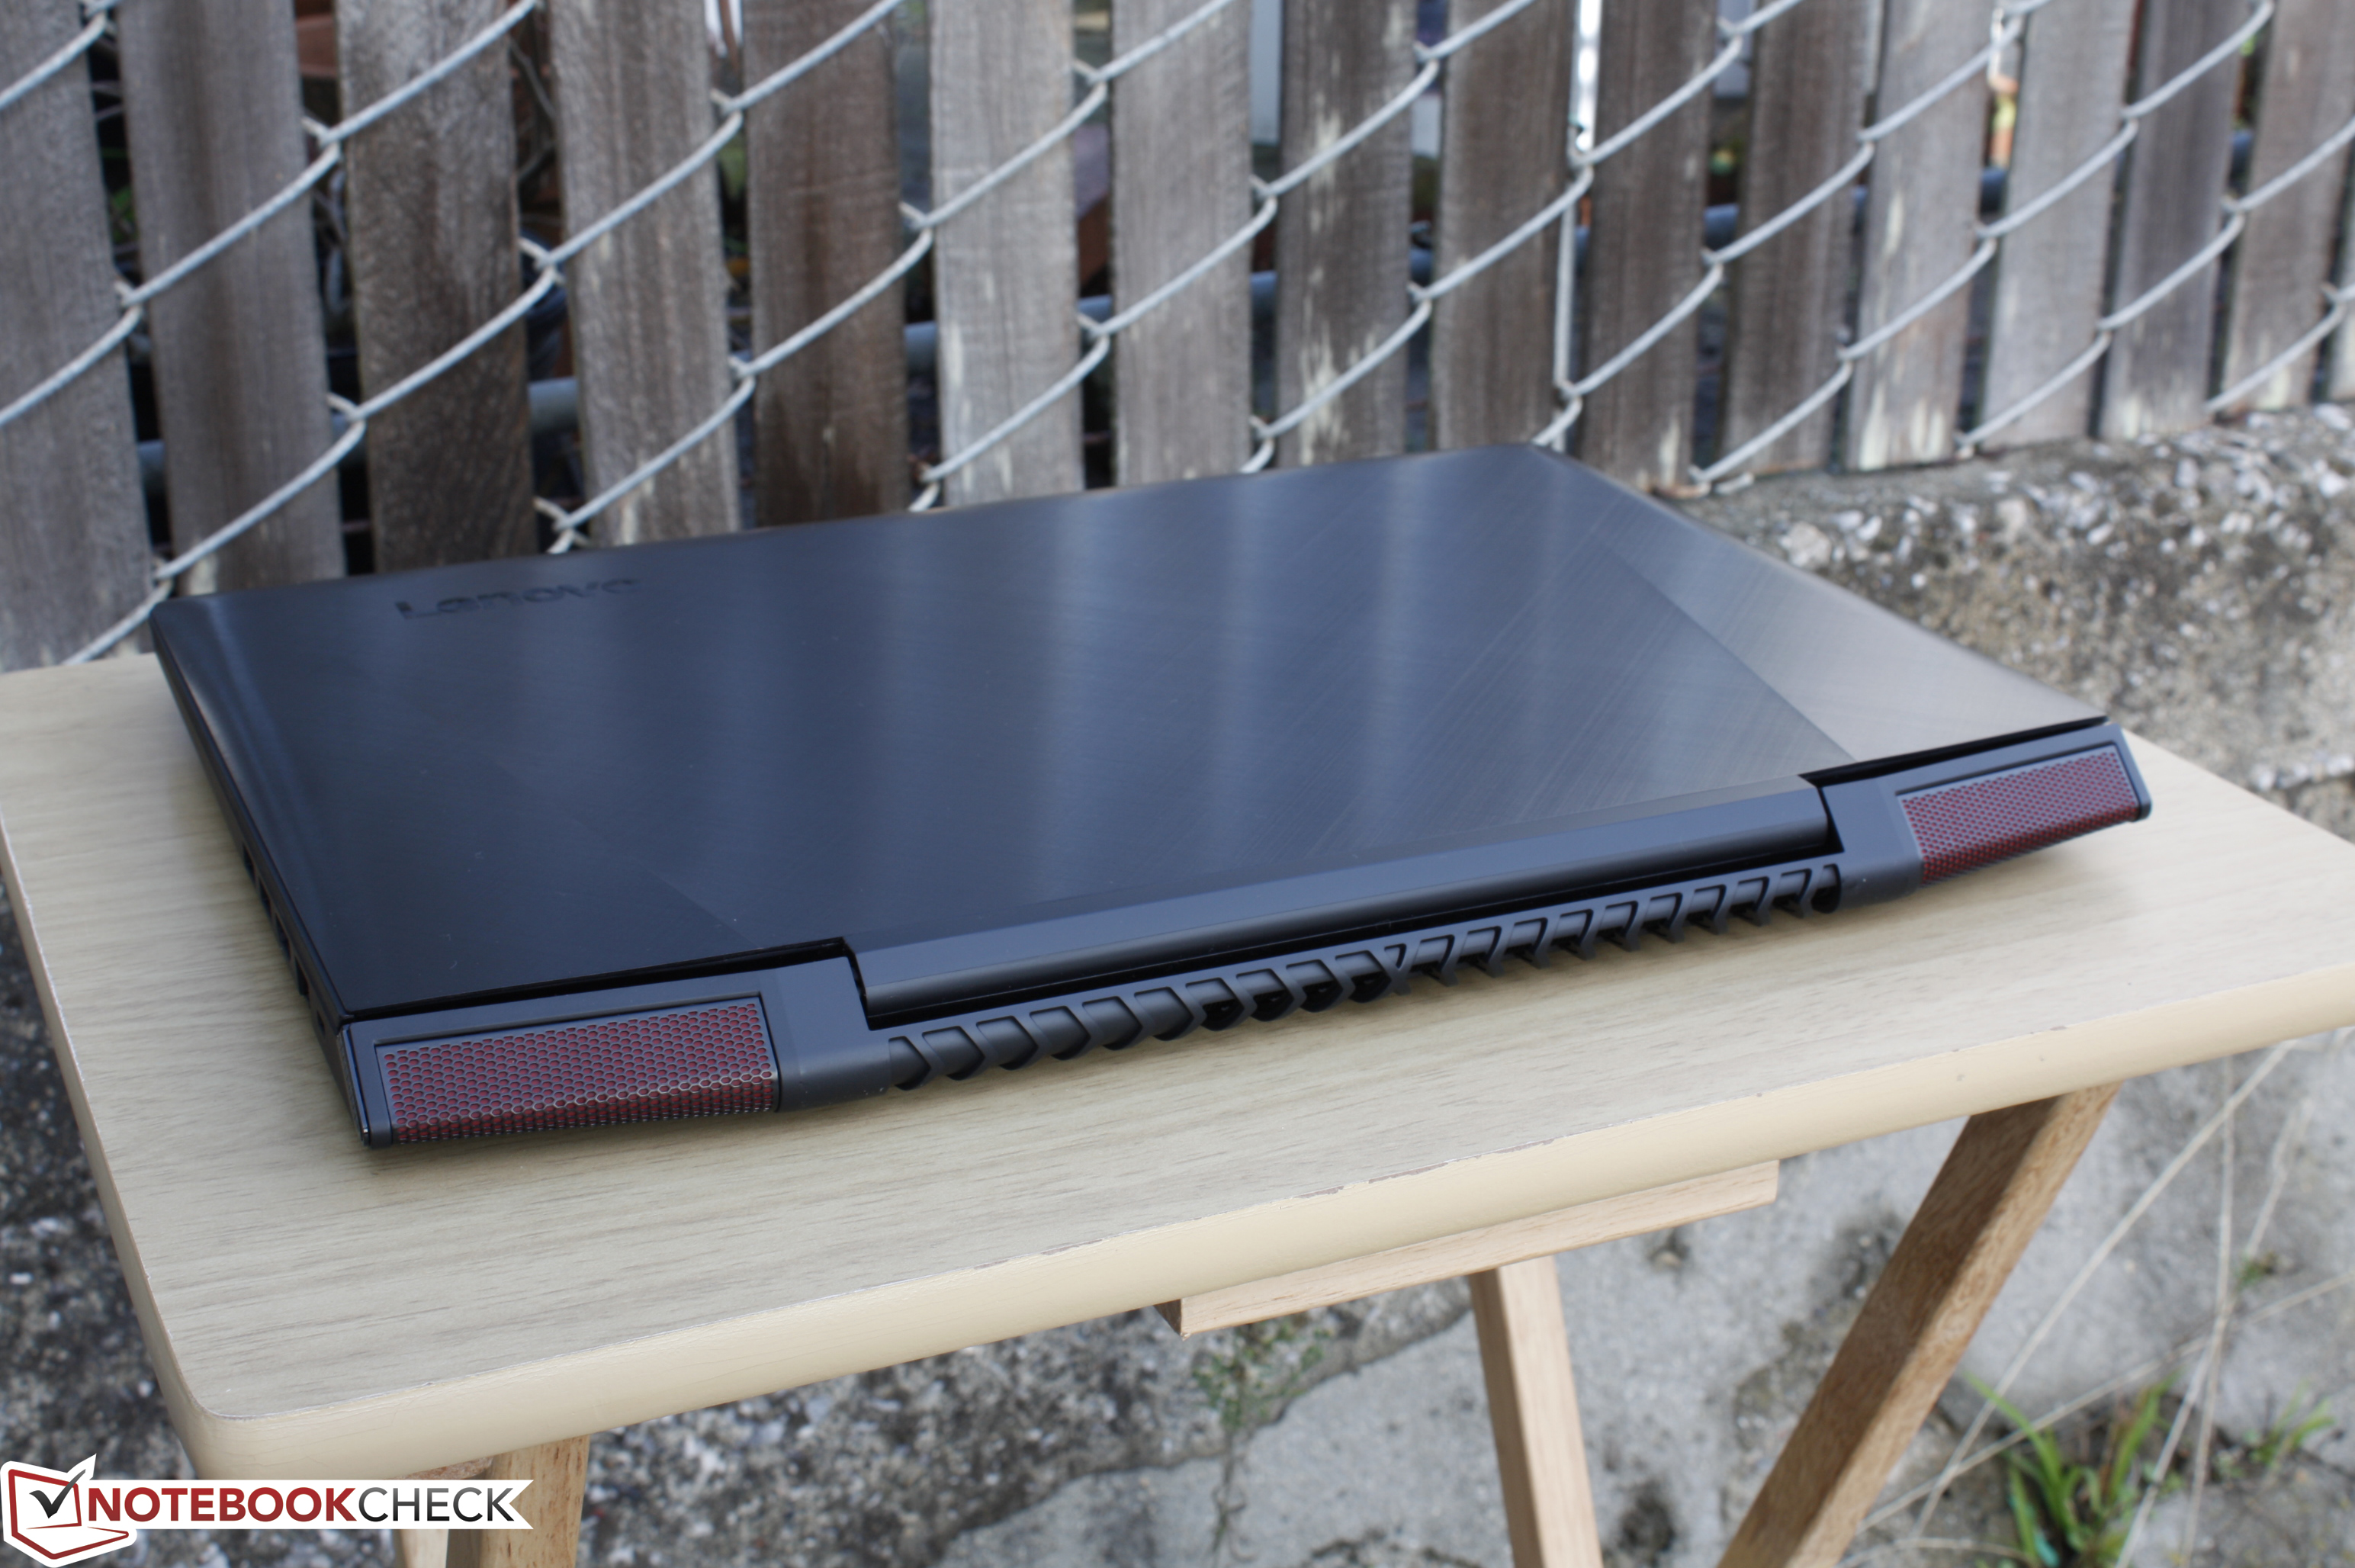 Kısa inceleme: Lenovo Ideapad Y700 15ISK 80NW Notebook